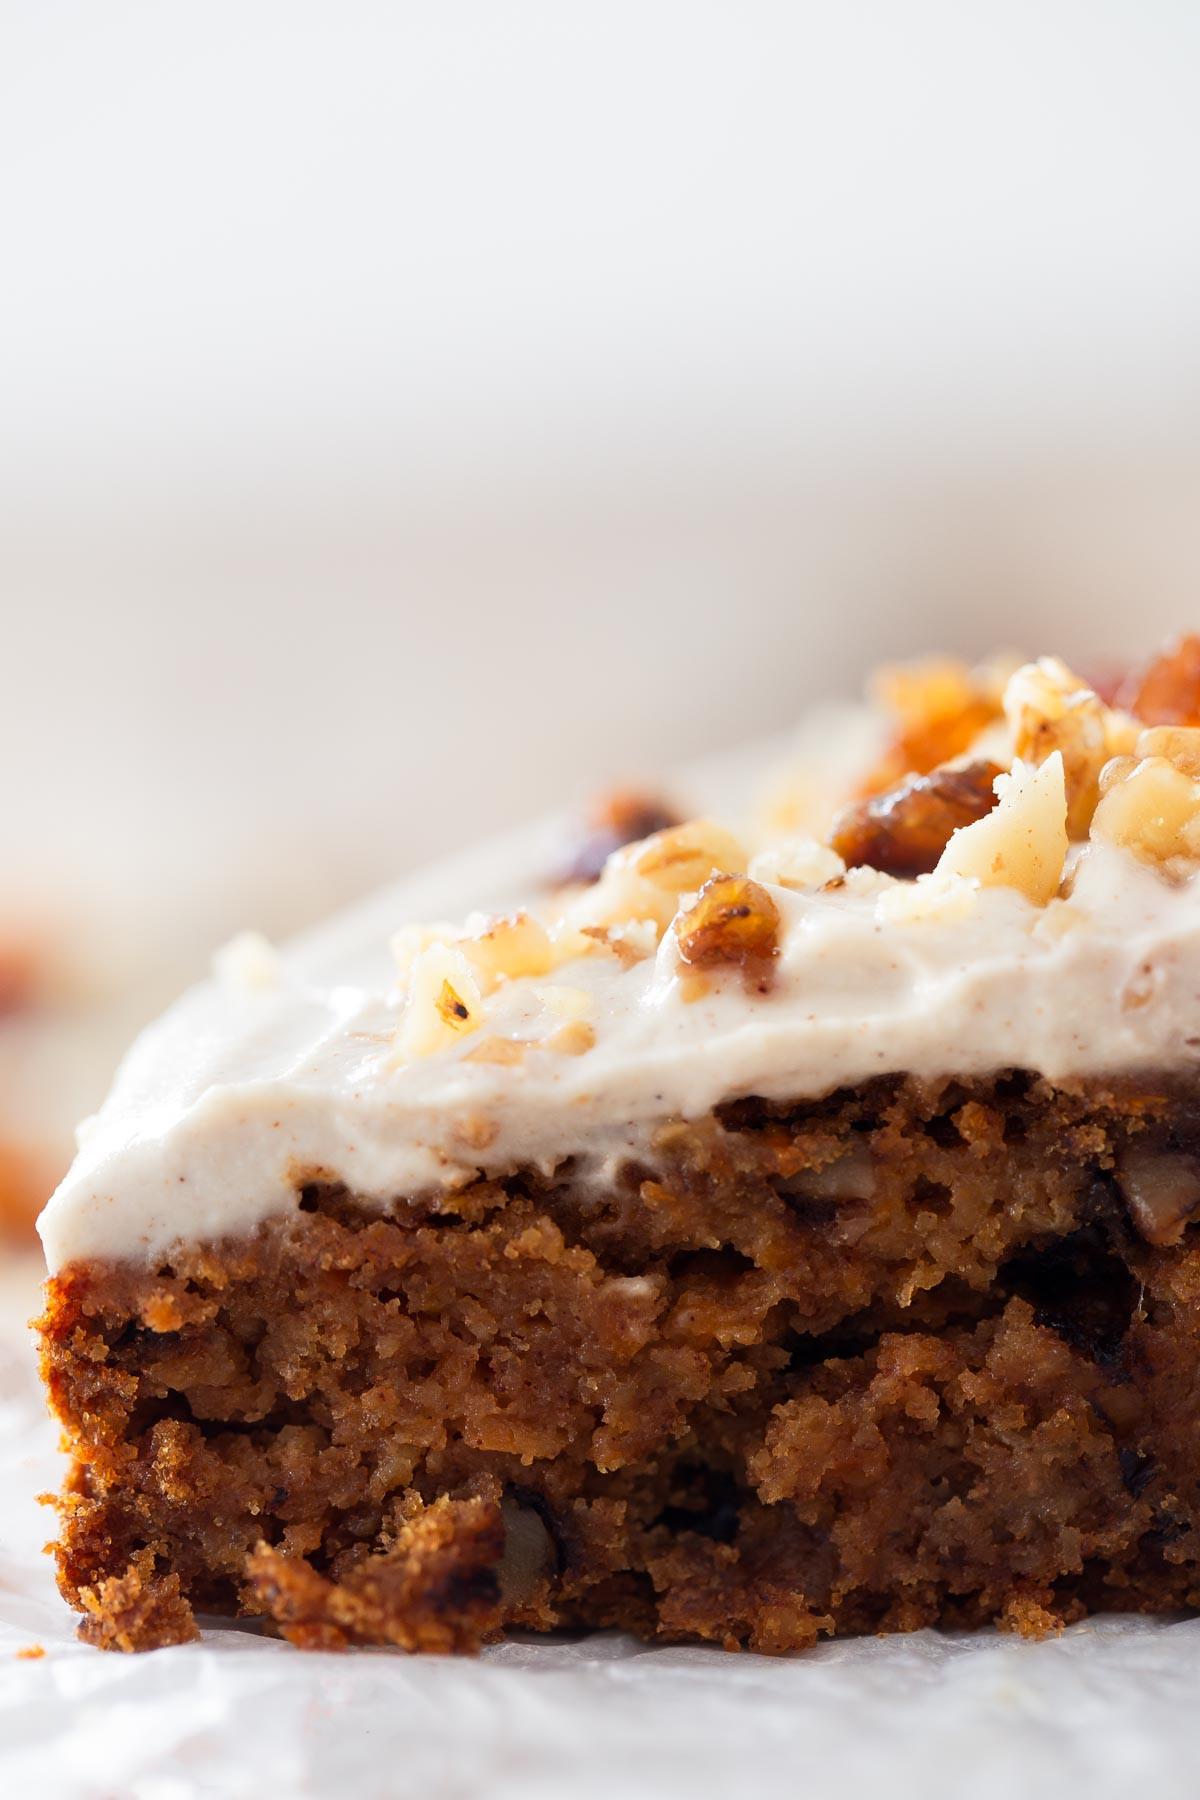 Best Healthy Carrot Cake Recipe  Vegan Carrot Cake Gluten Free